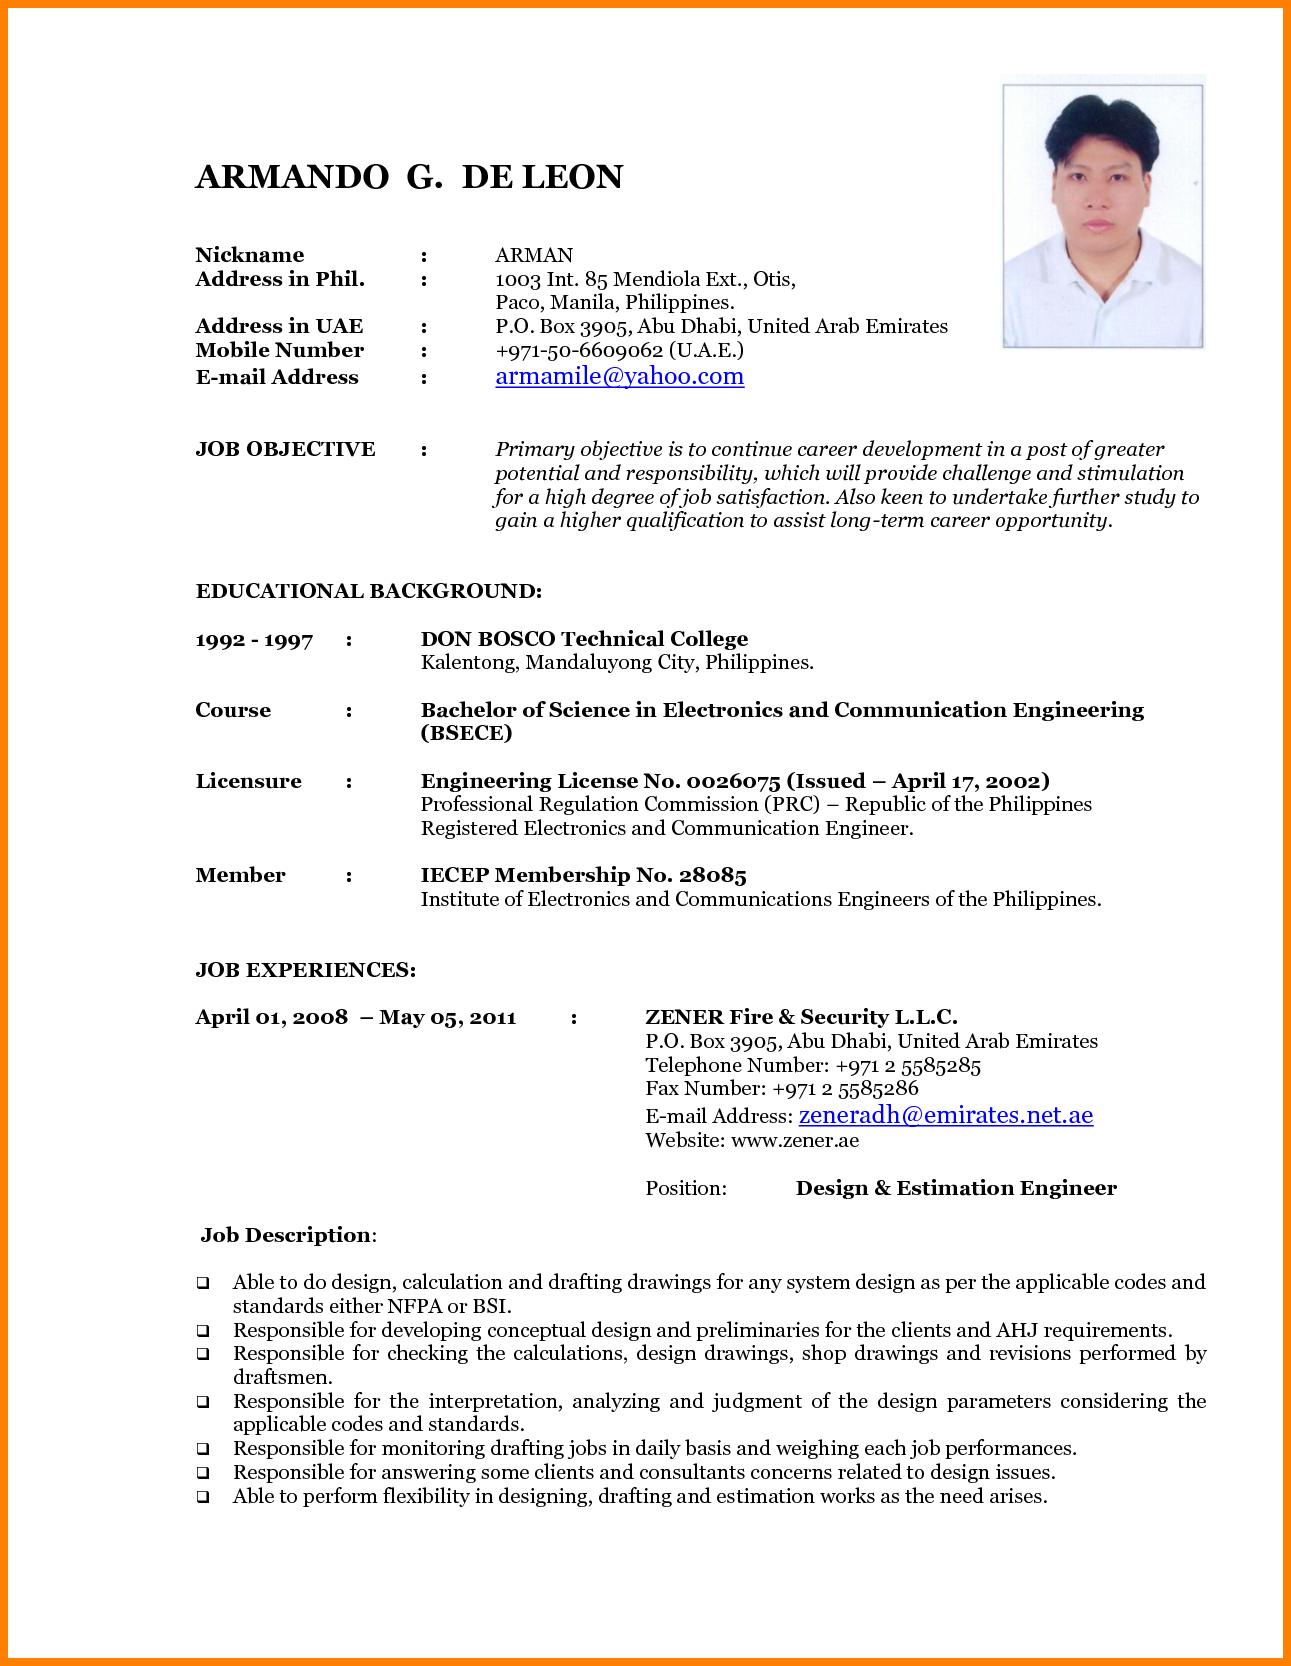 Resume Format Latest Resume format, Latest resume format